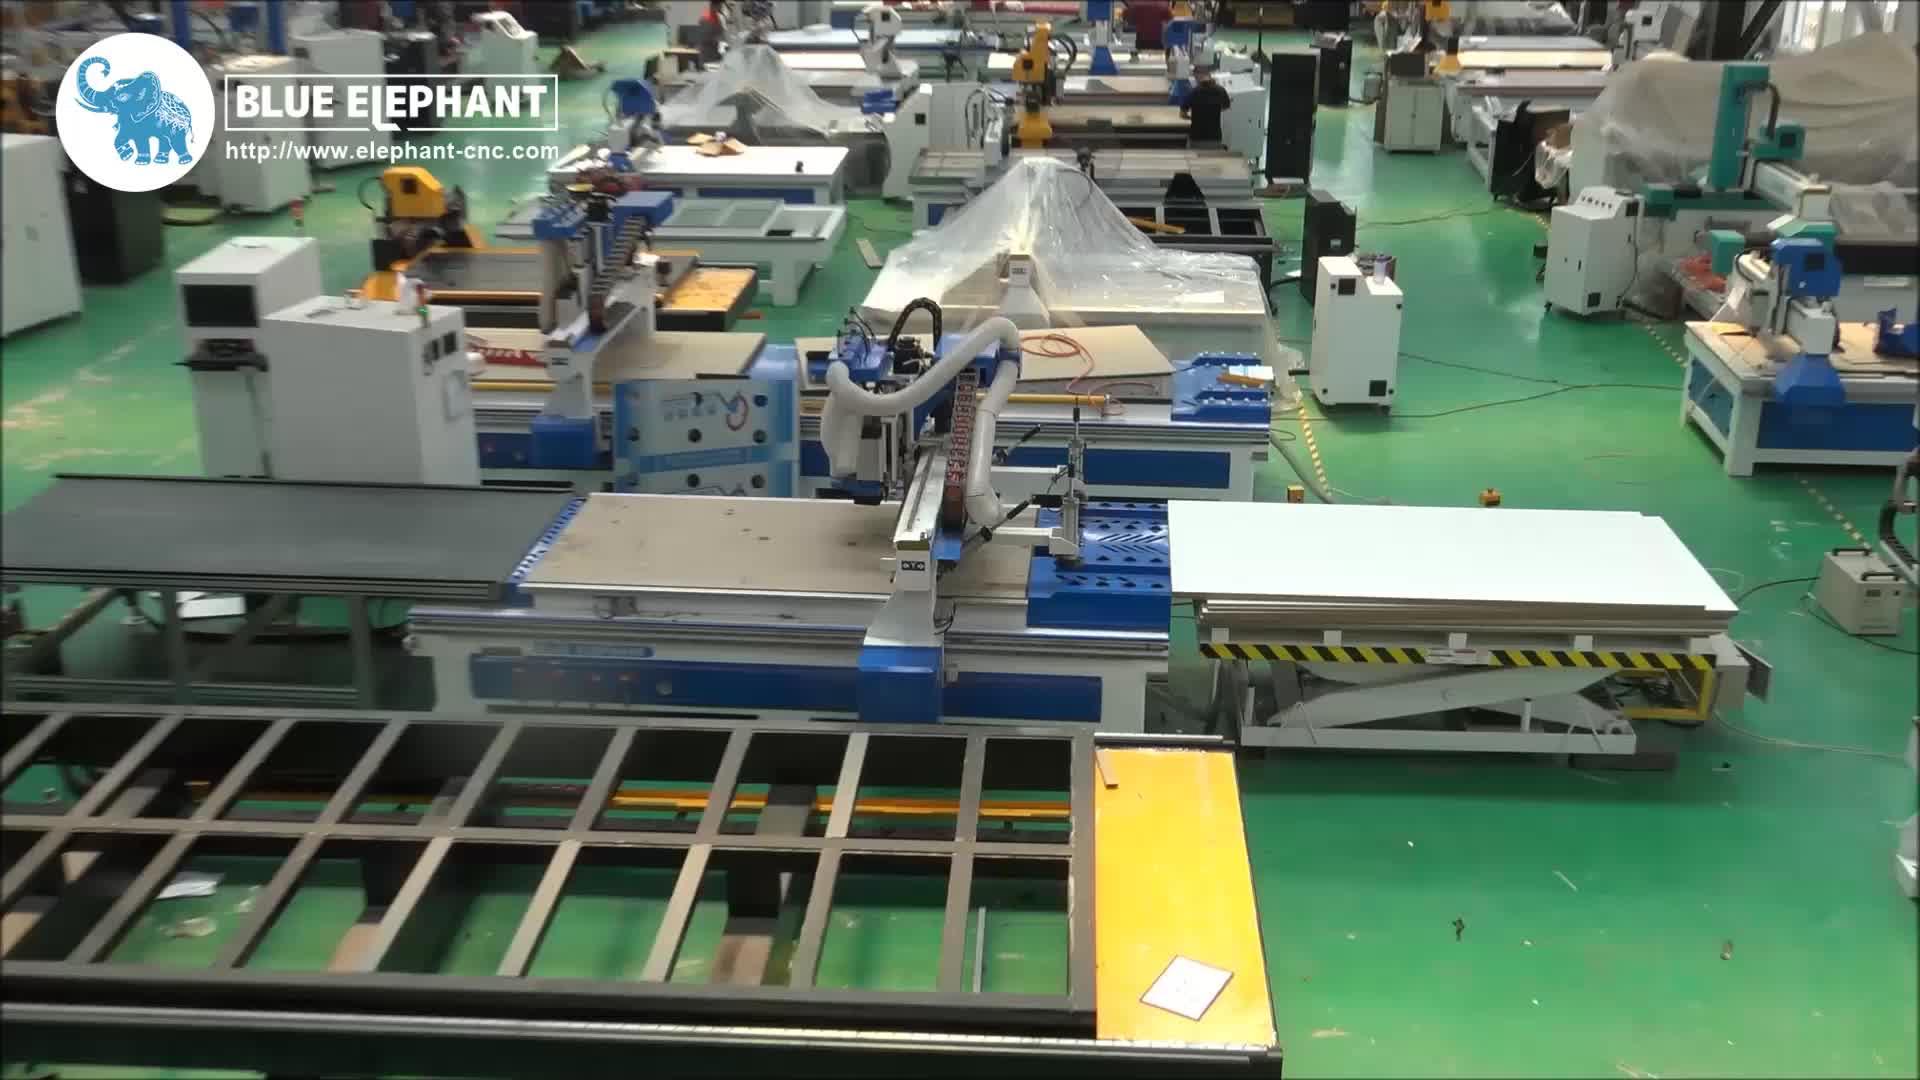 Houtbewerking cnc machine ELE 1330 multi spindel cnc router voor bouwmaterialen